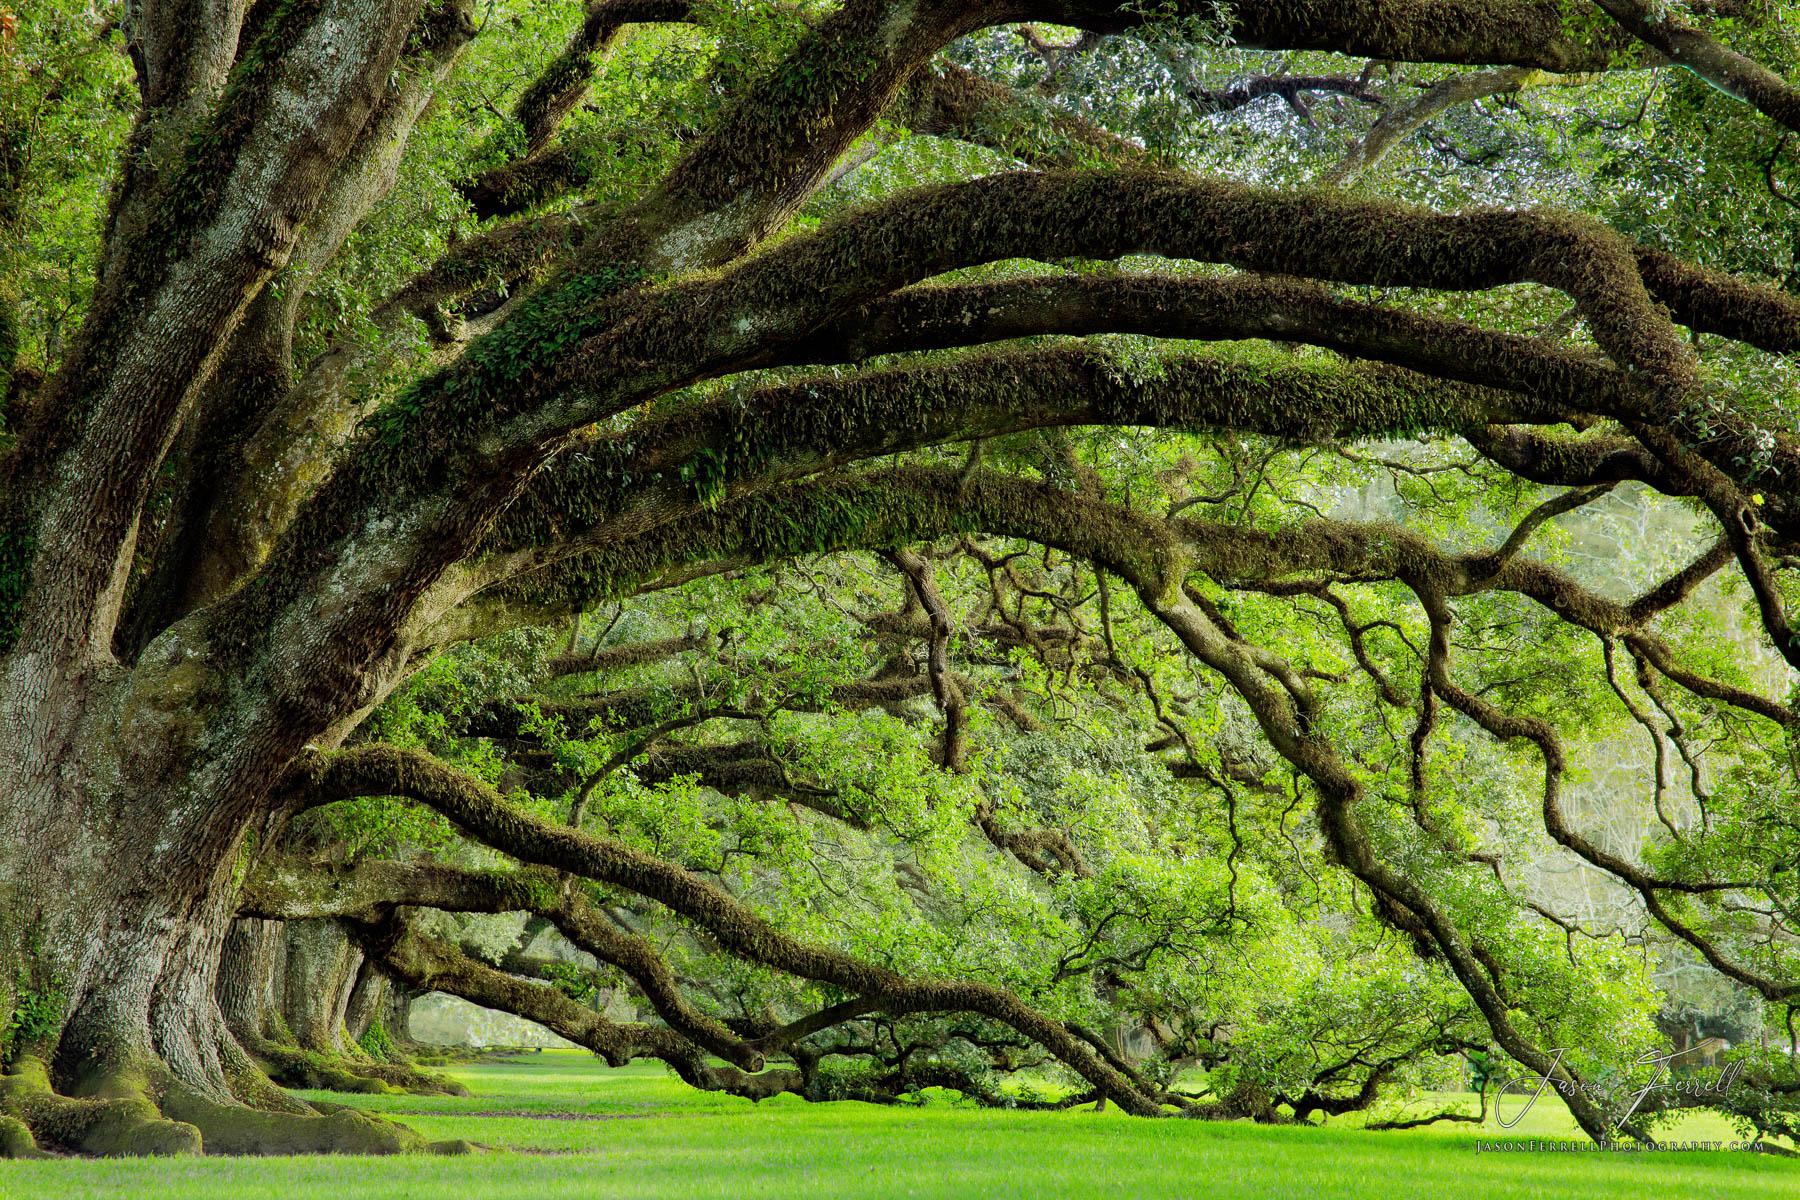 oak, tree, alley, plantation, vacherie, louisiana, old, big, antebellum, civil war, oaks of antebellum, spanish moss, photo